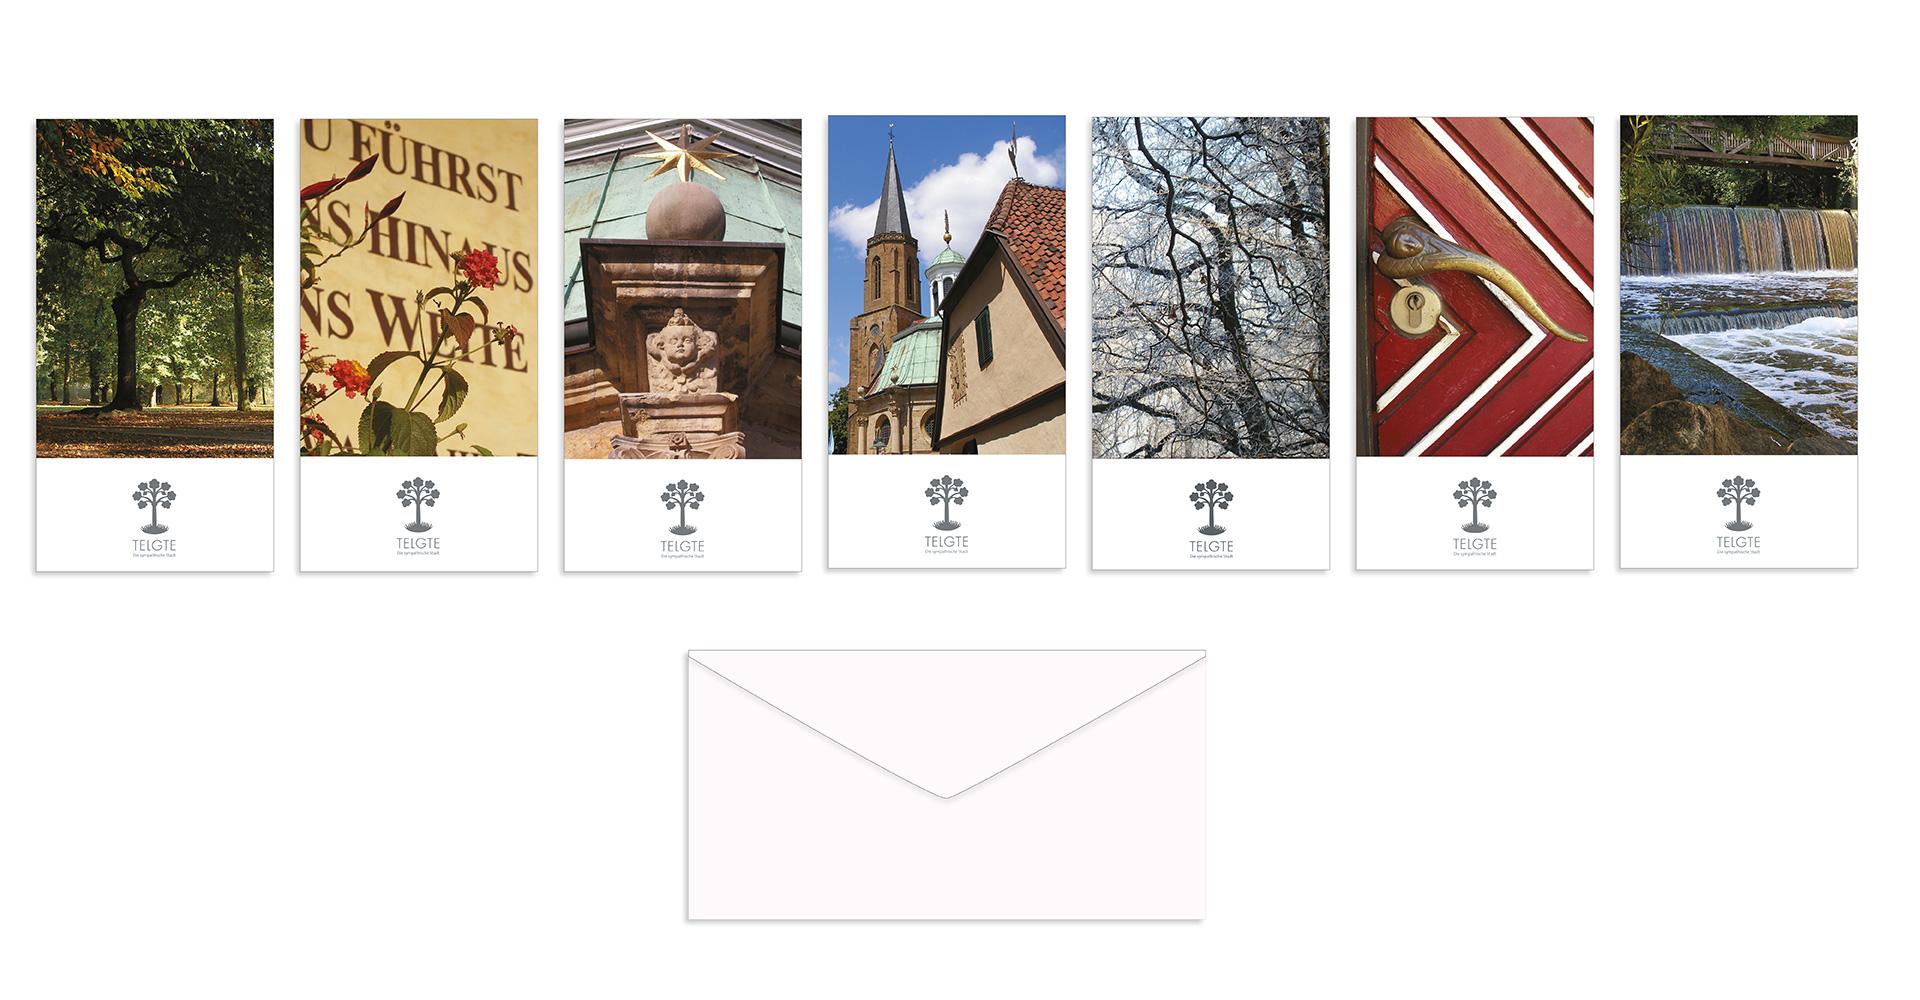 Postkarten_Telgte